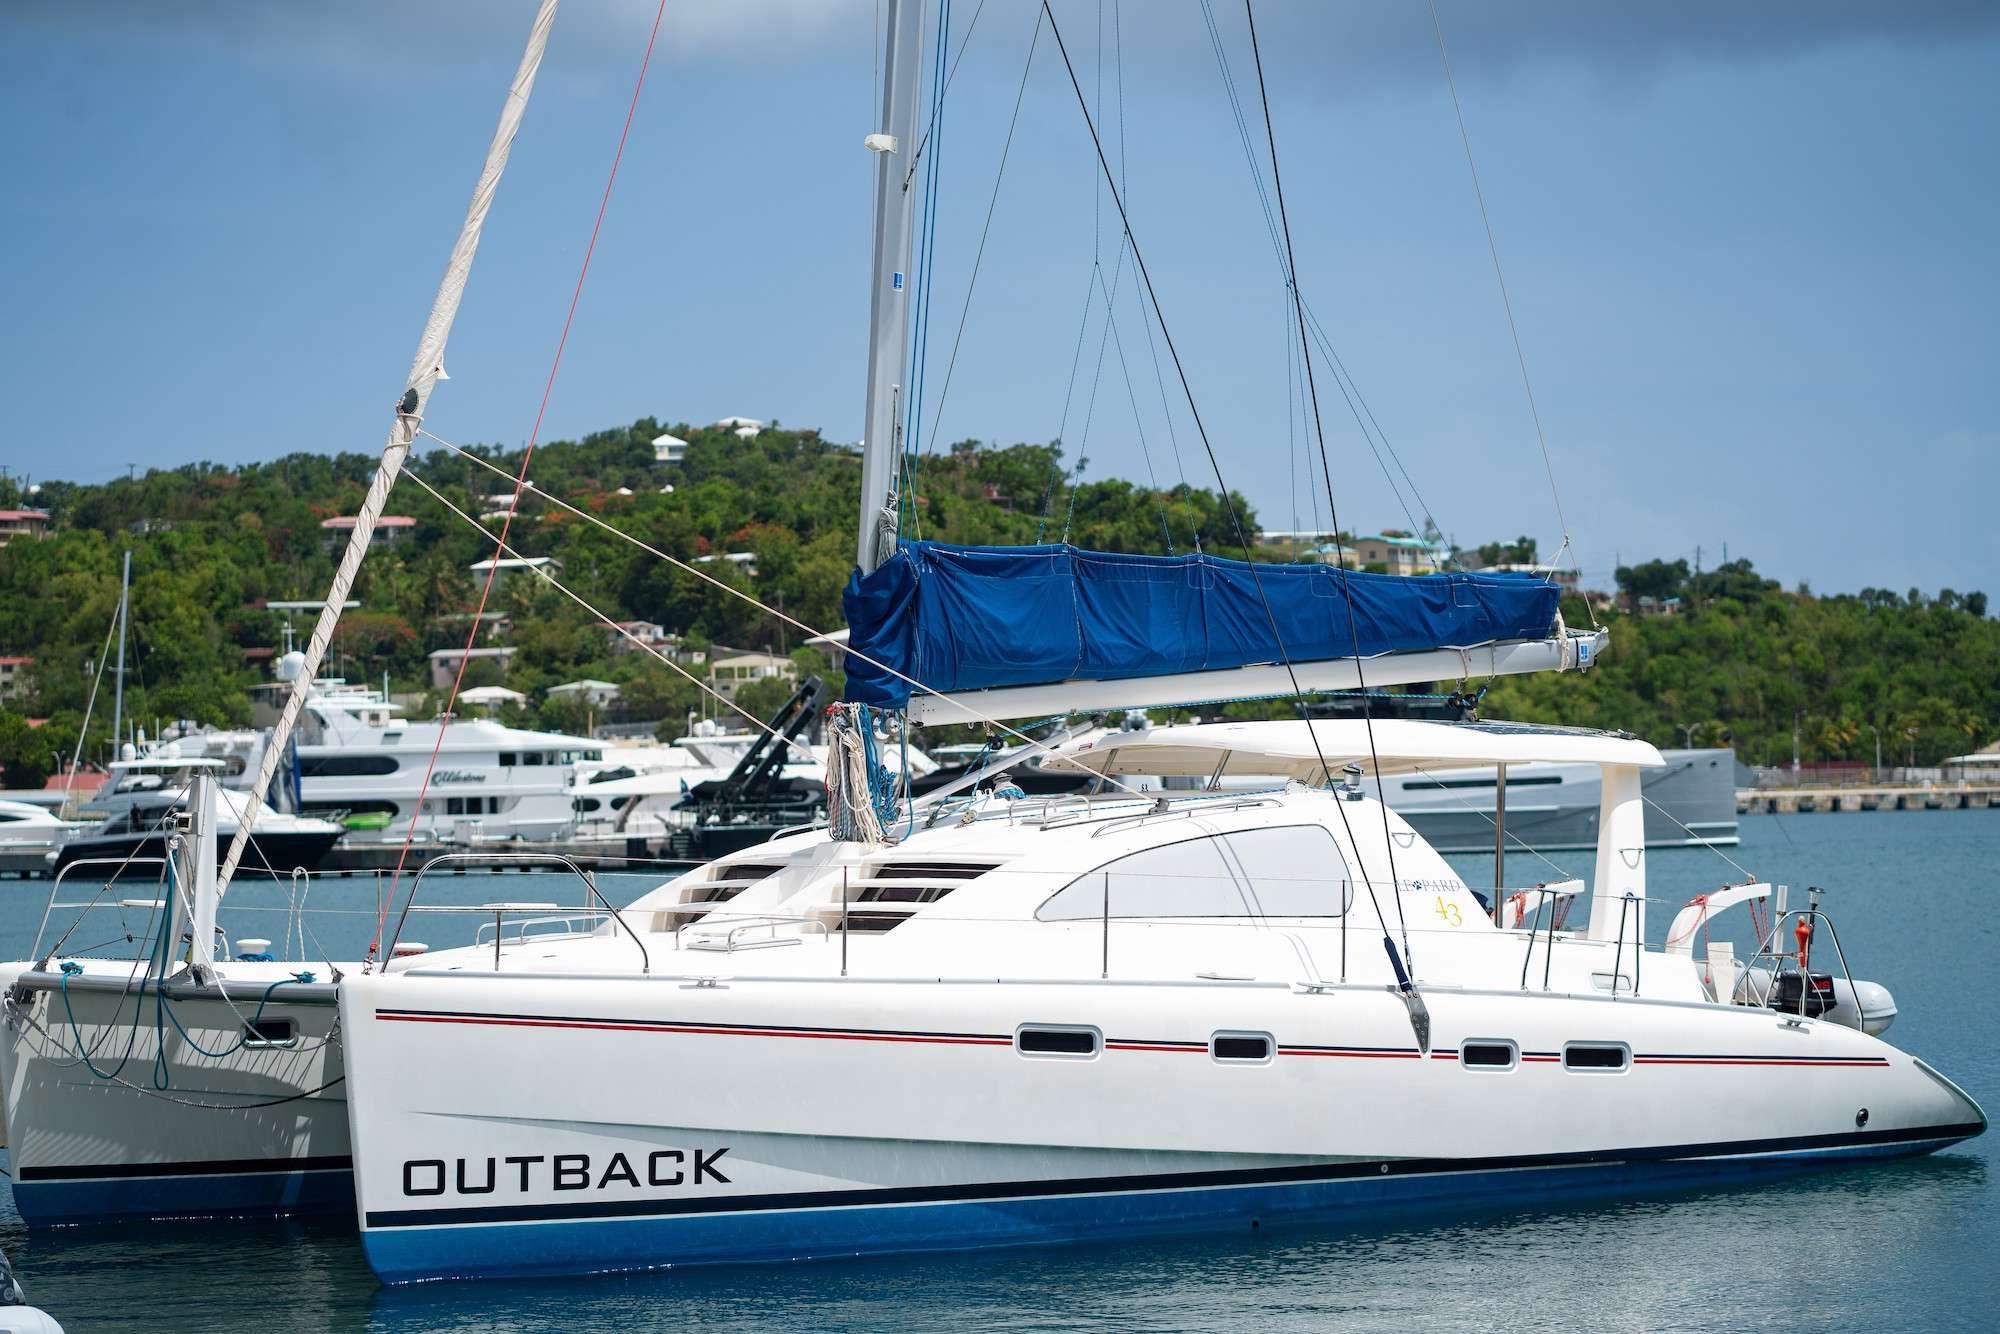 OUTBACK - Leopard 43 - 3 Cabins - Virgin Islands - St Thomas - Tortola - Virgin Gorda - St John